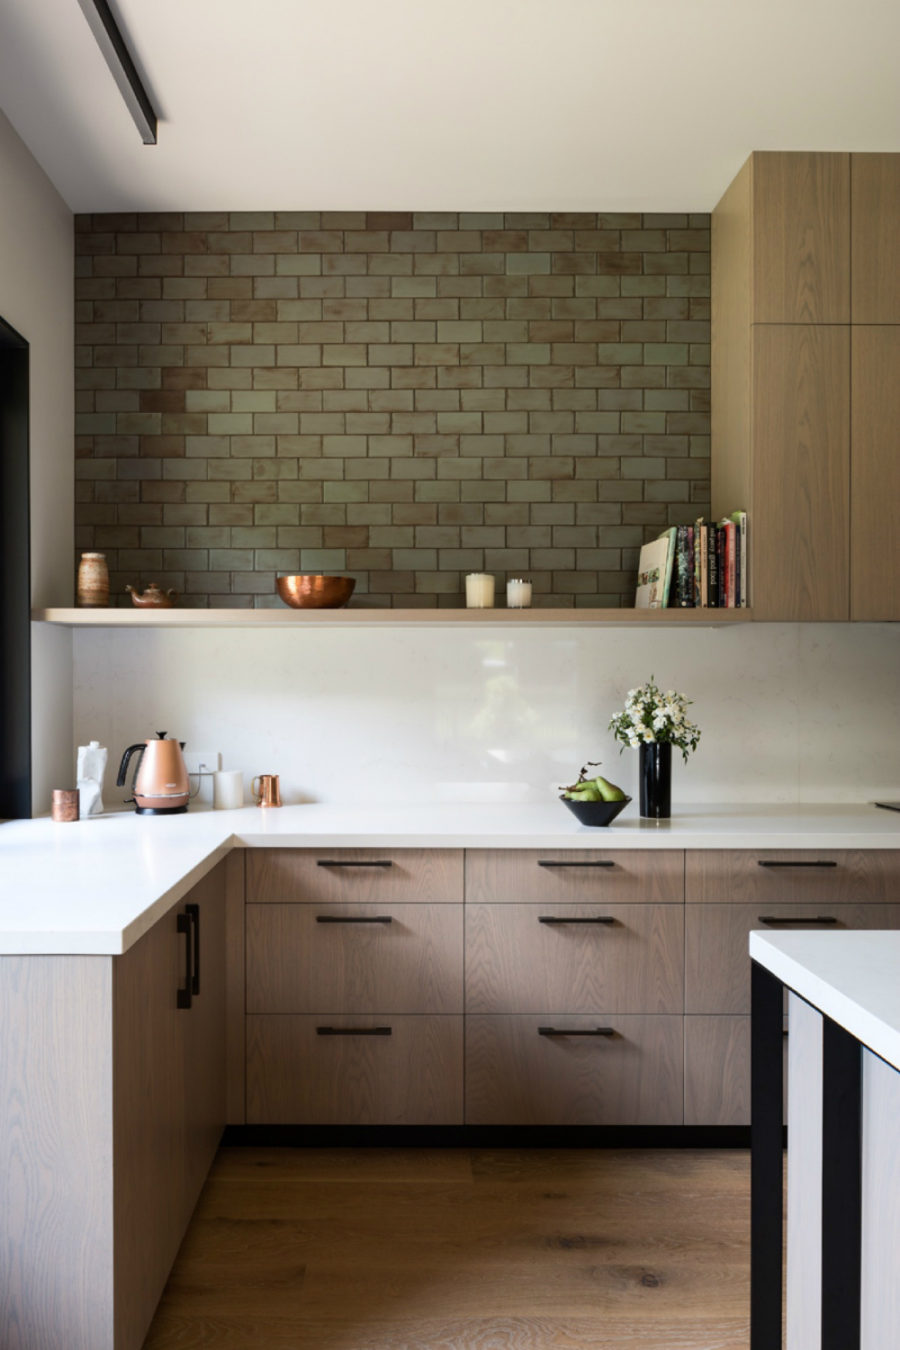 Simple kitchen design involves Corian countertops and upper shelves